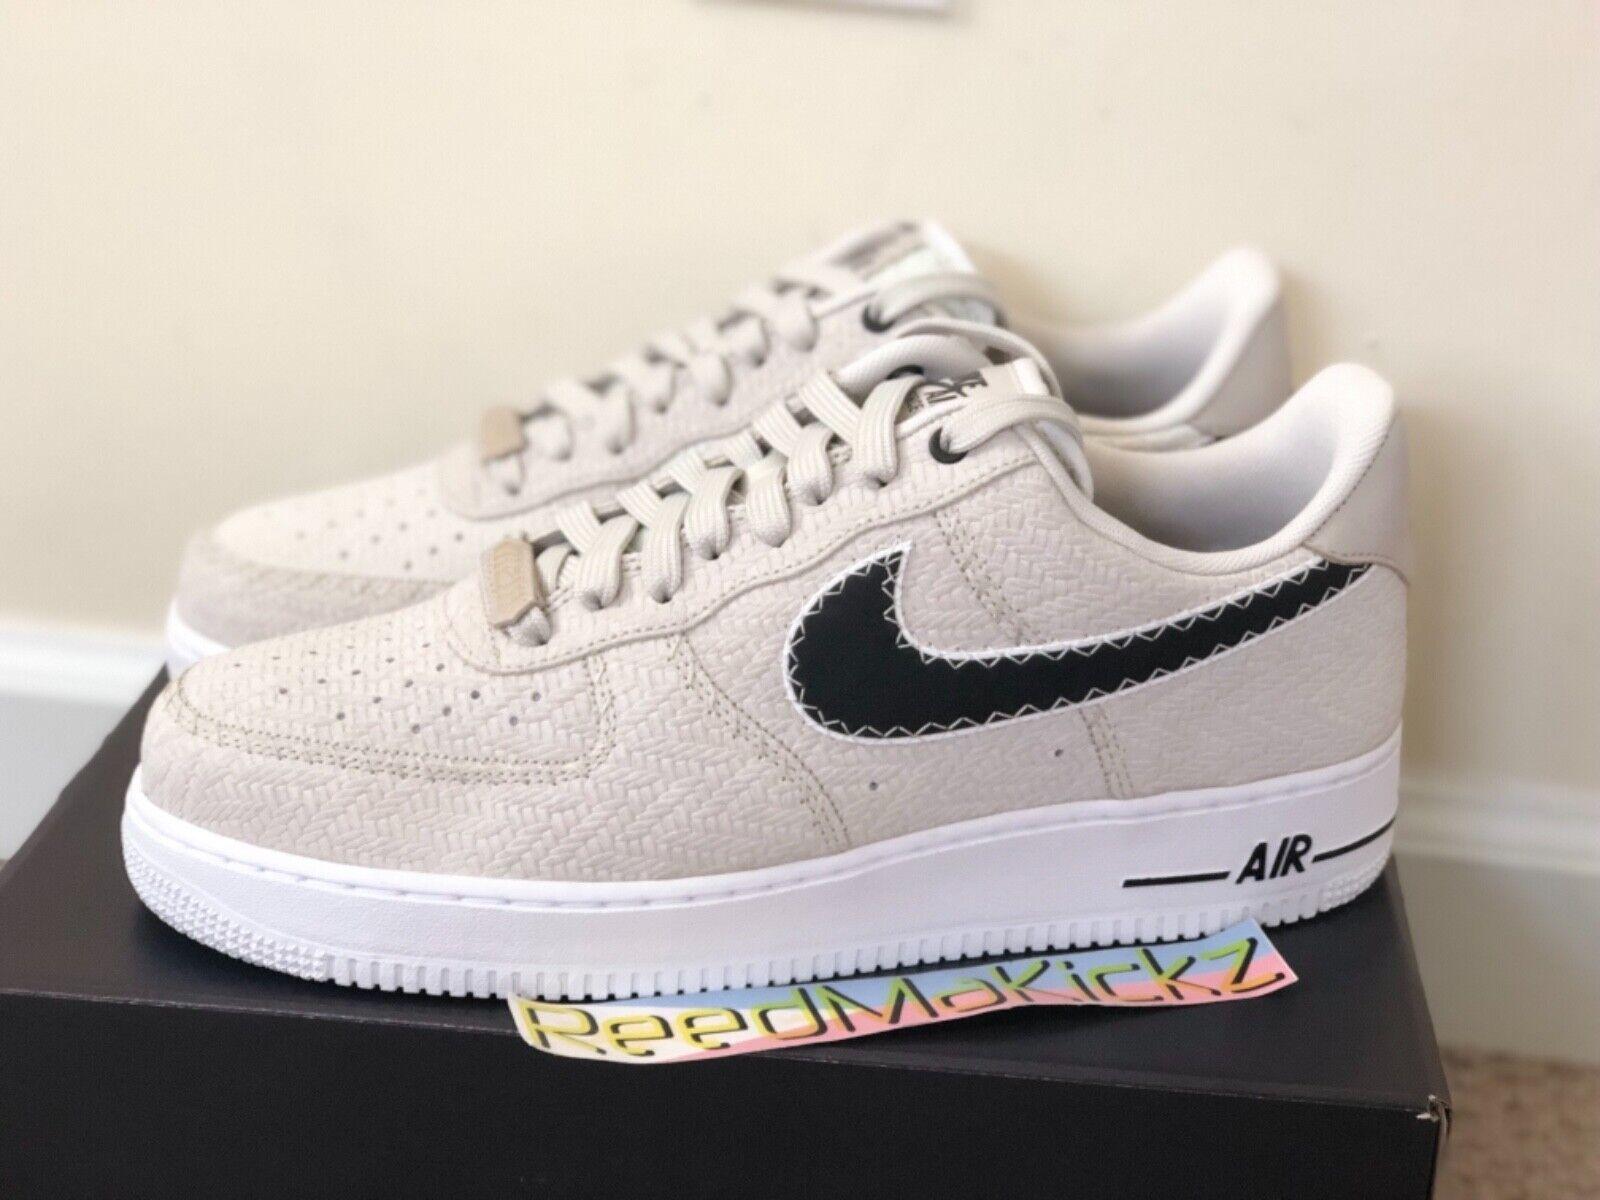 Nike Air Force 1 Low '07 N7 Light Bone Black White Mens sizes AO2369 001